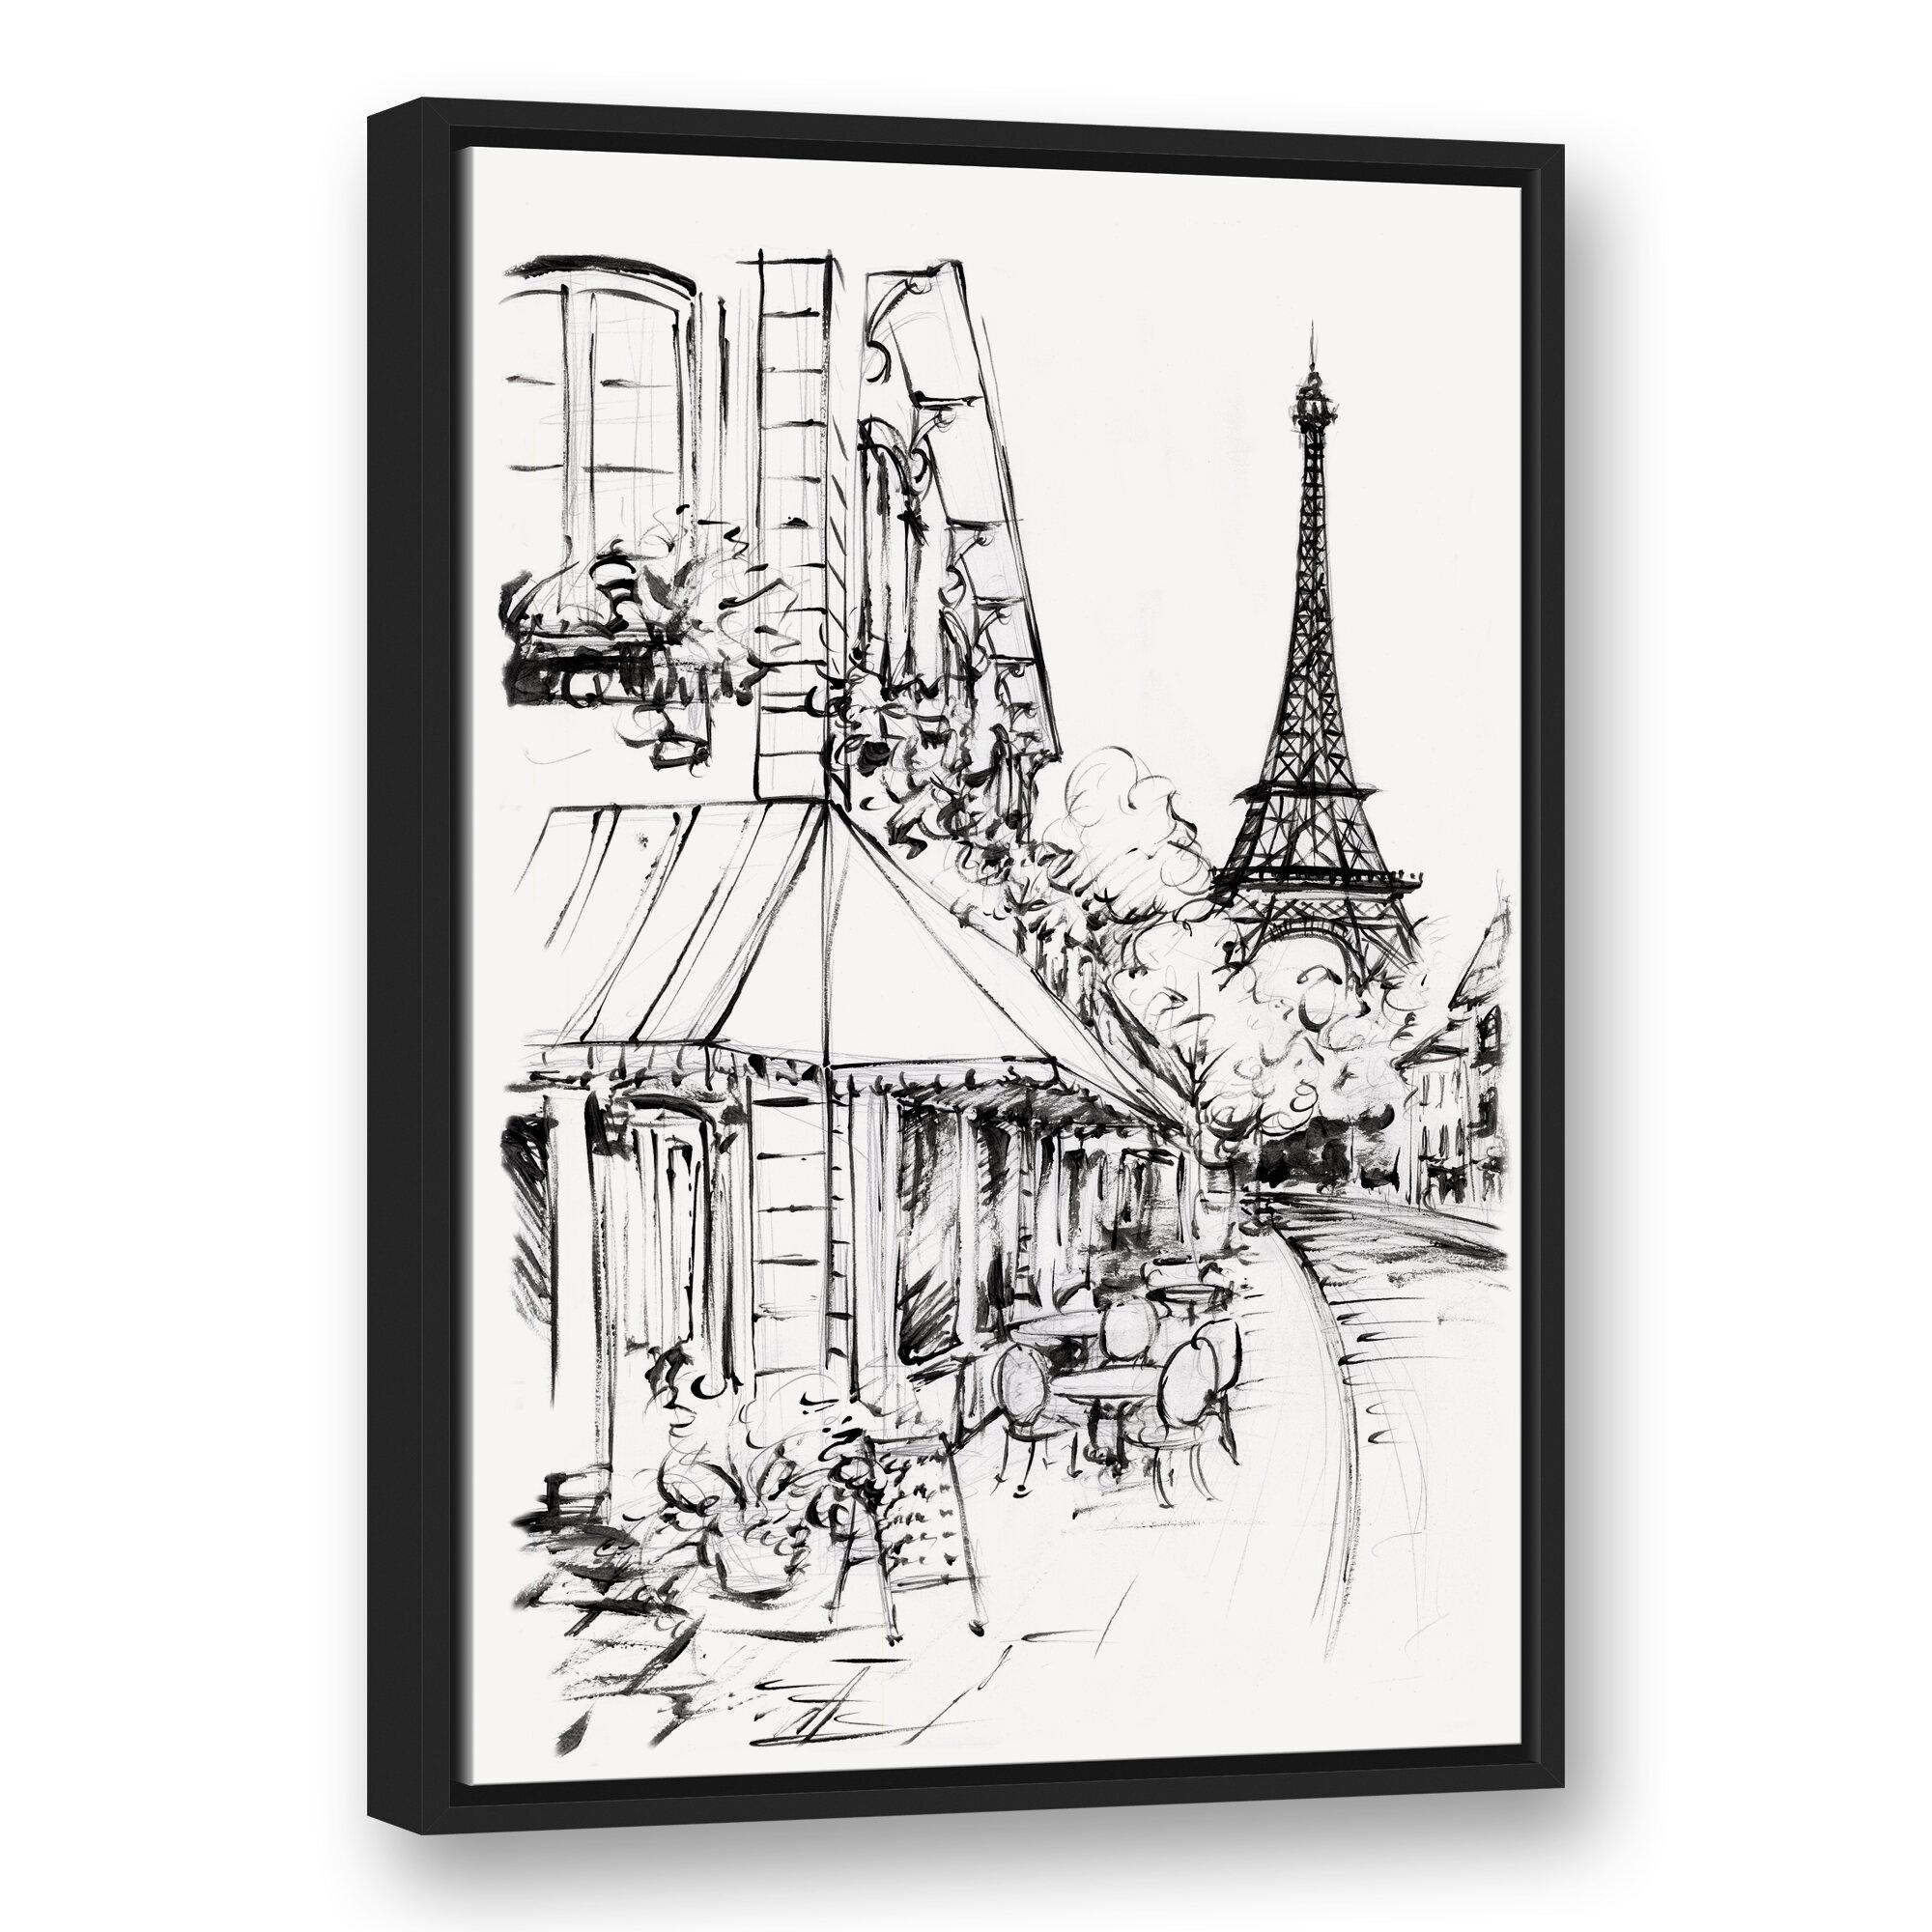 Ophelia Co Paris Street Sketch Framed Drawing Print On Canvas Wayfair